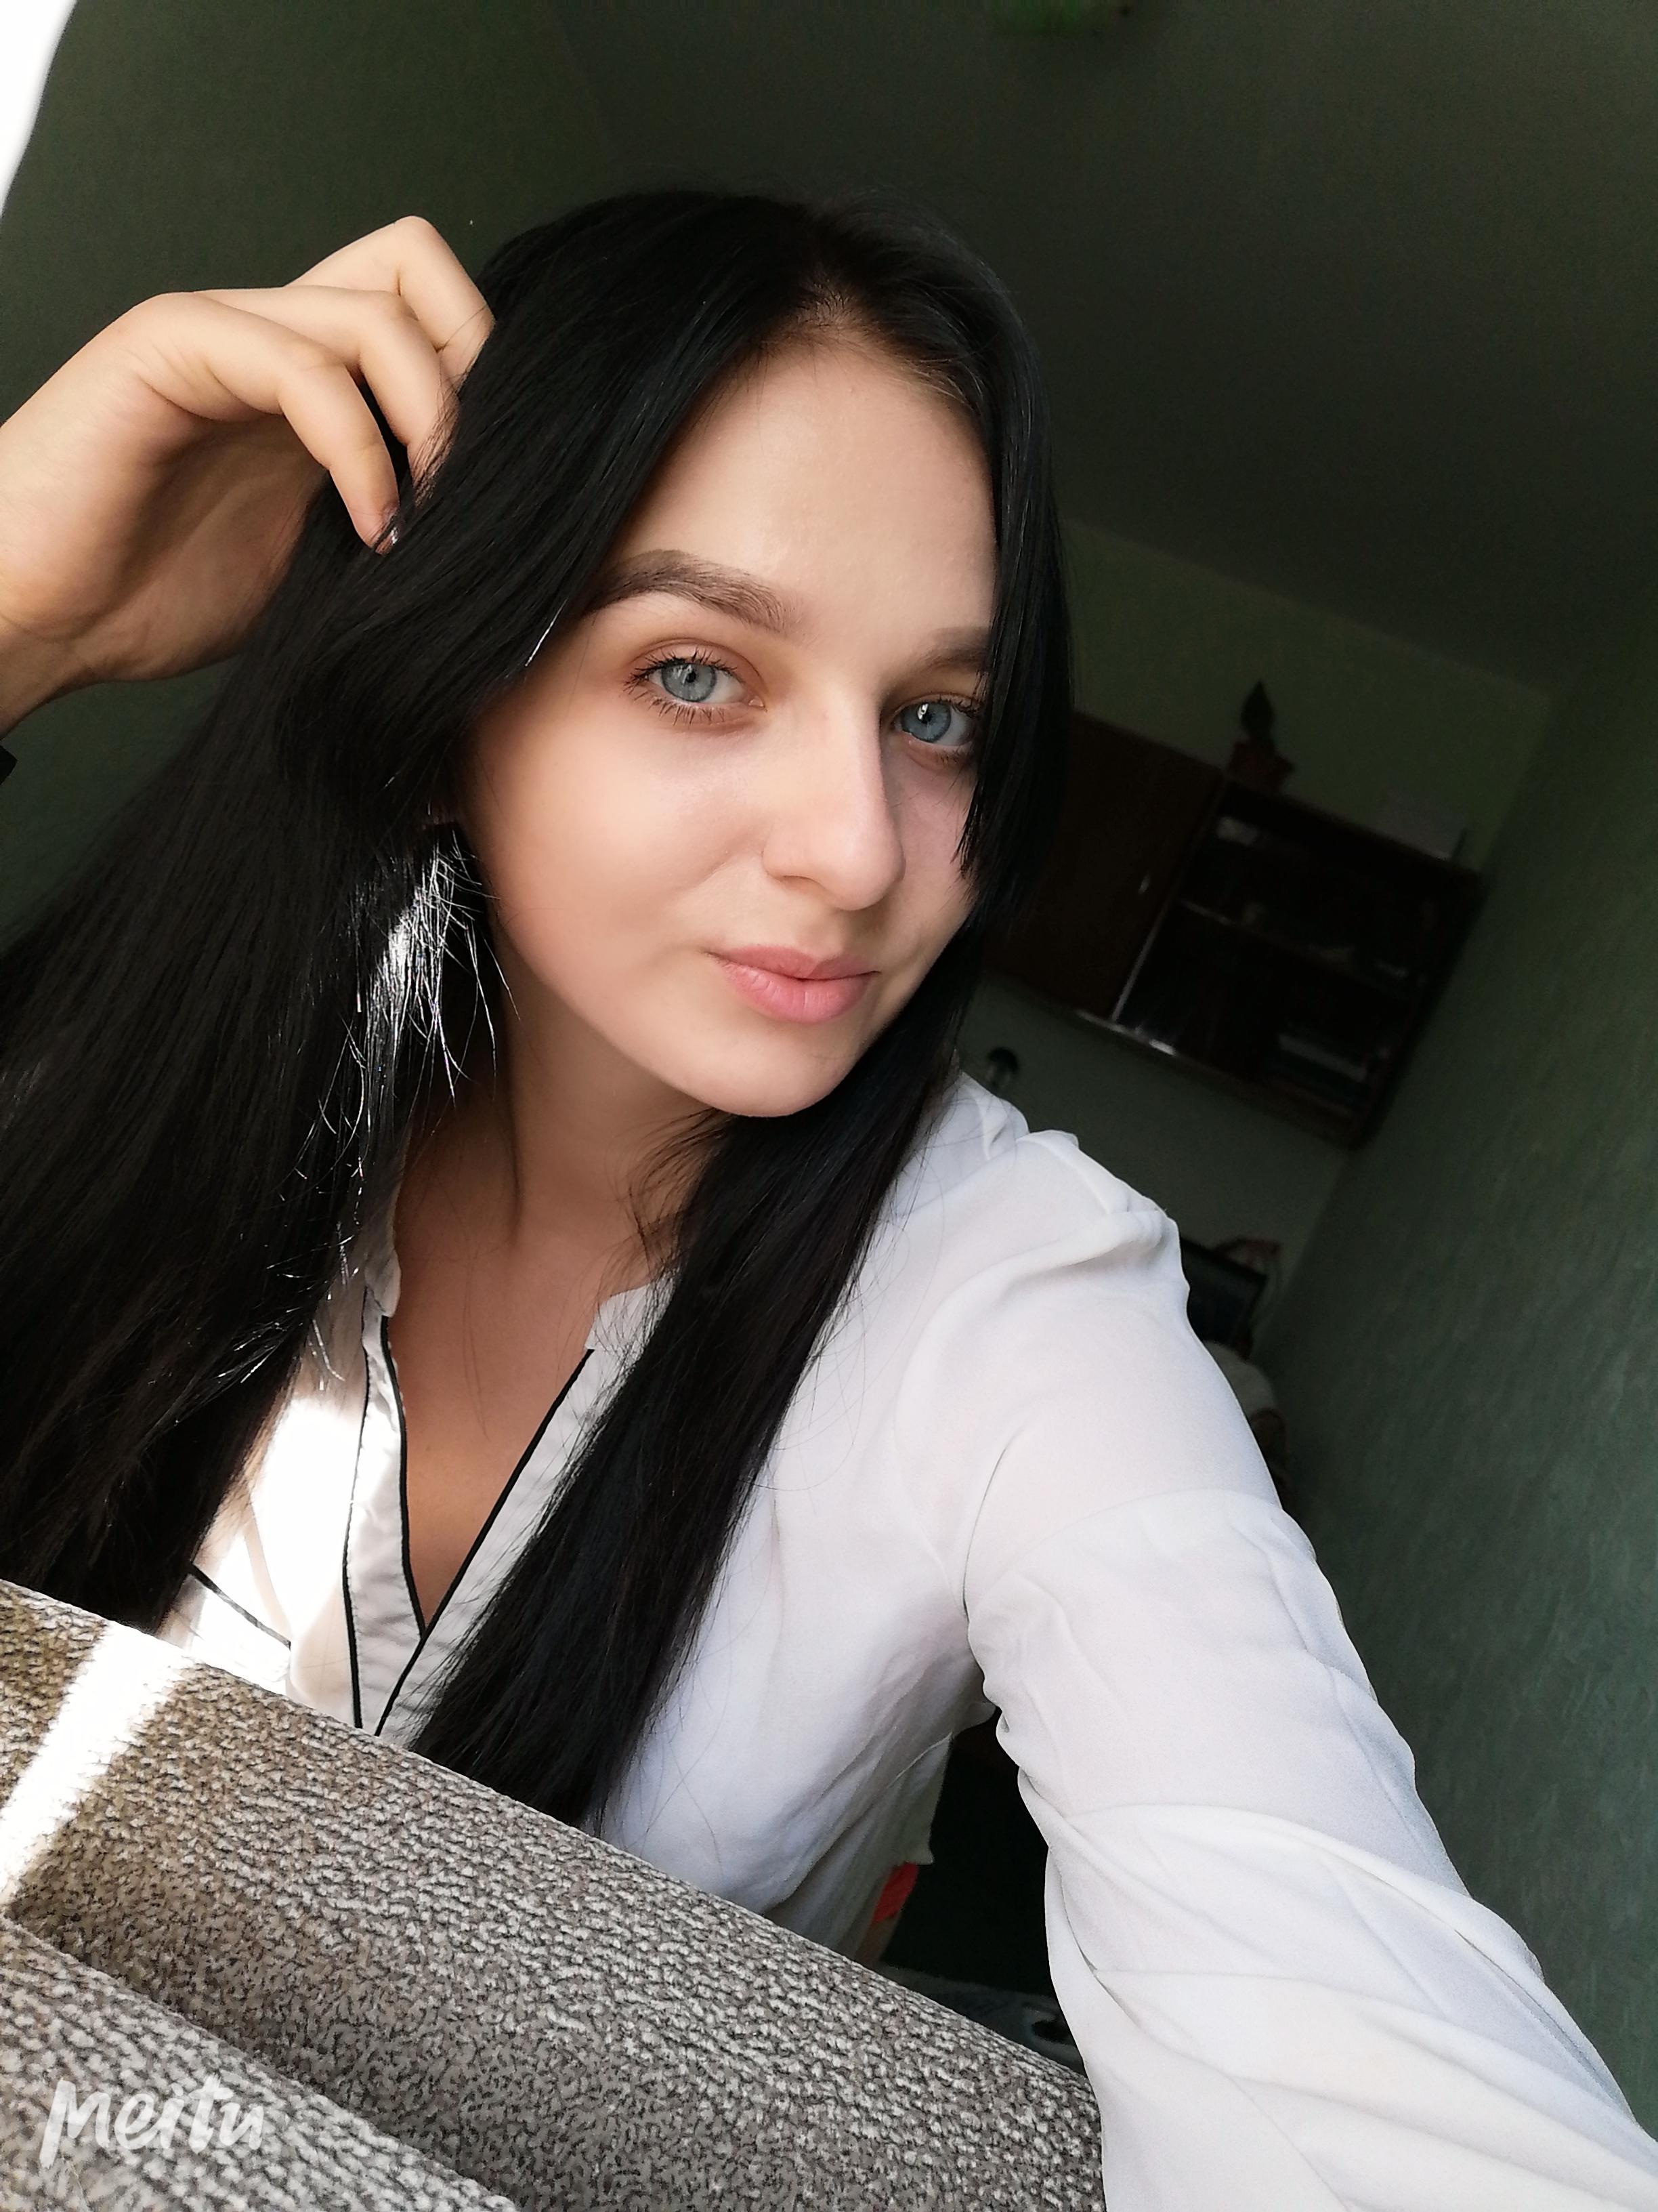 Imagen con etiquetas:Video chat, Real, Muchachas, Belleza